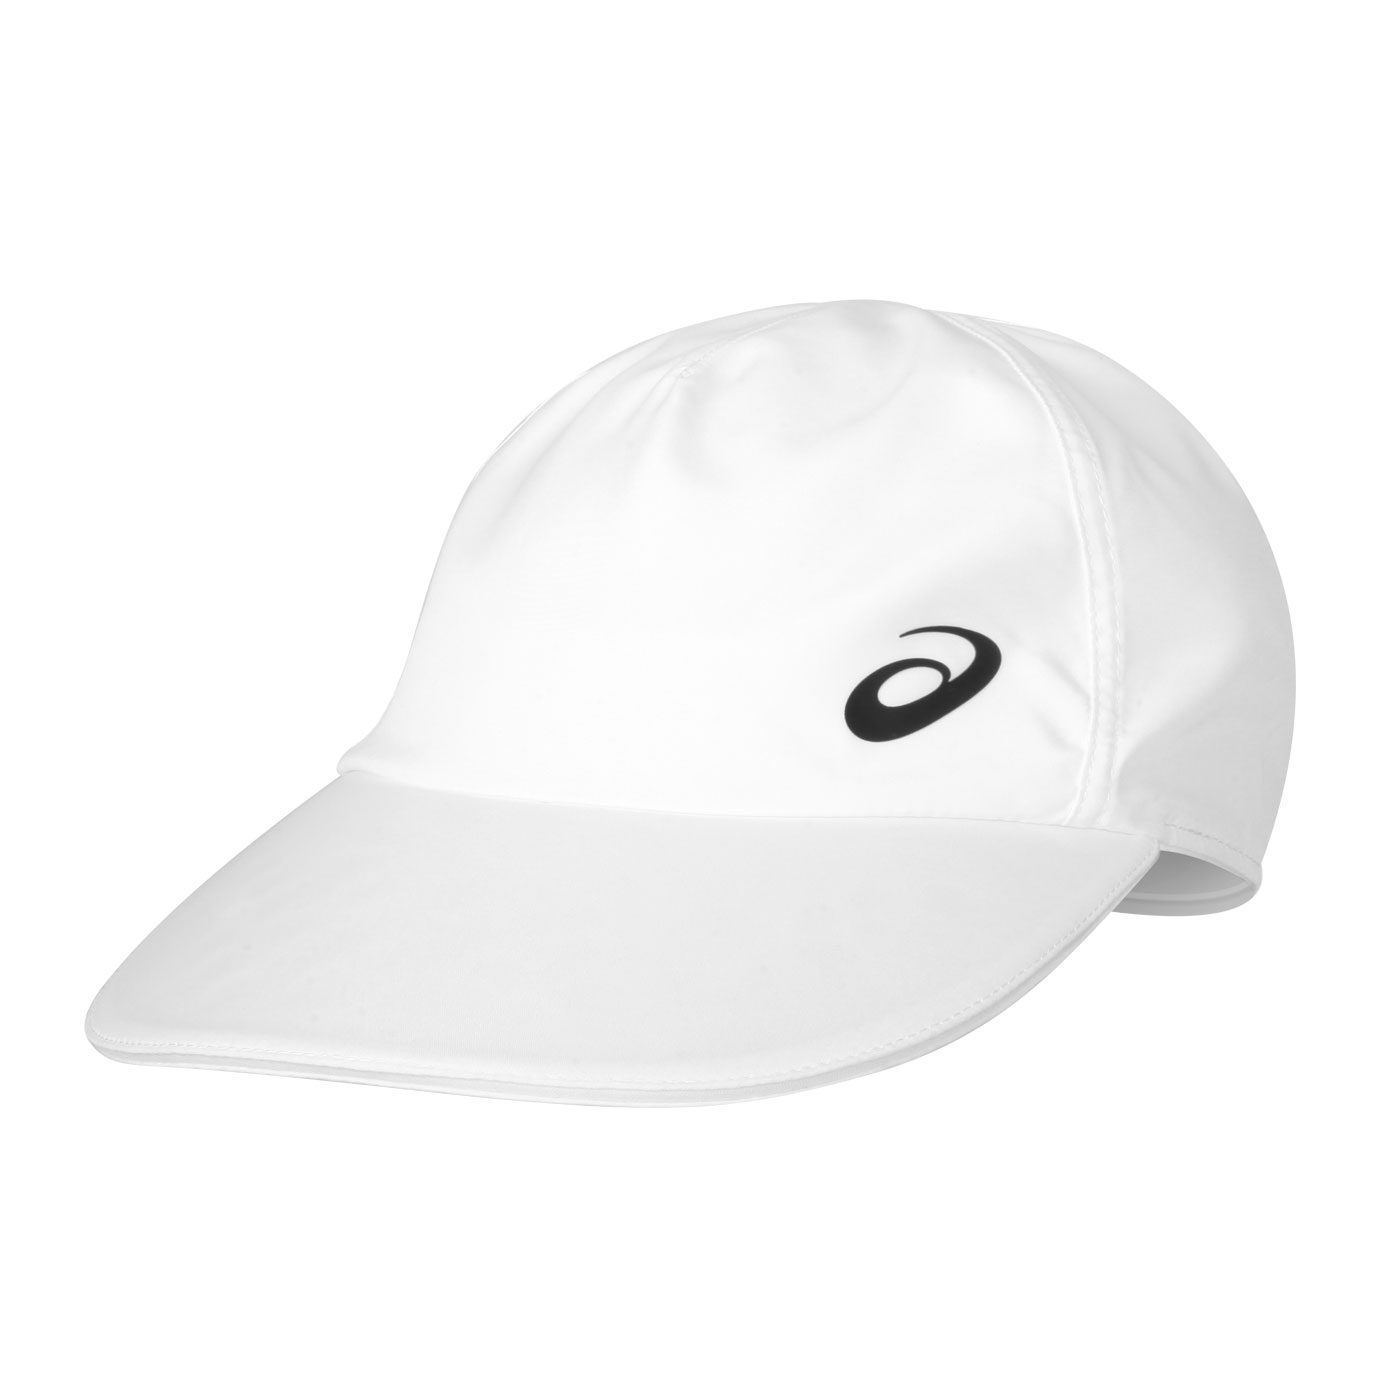 ASICS 平織帽 3043A048-101 - 白黑